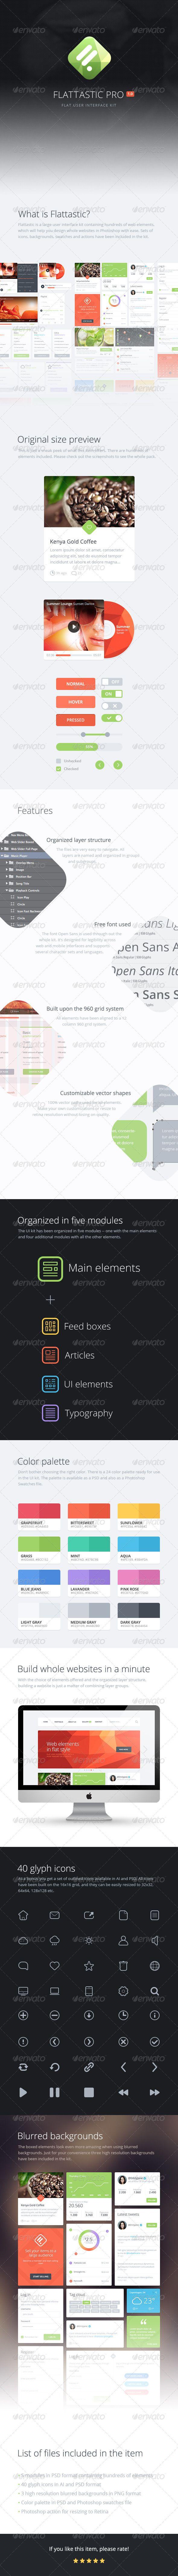 Flattastic Pro - User Interfaces Web Elements